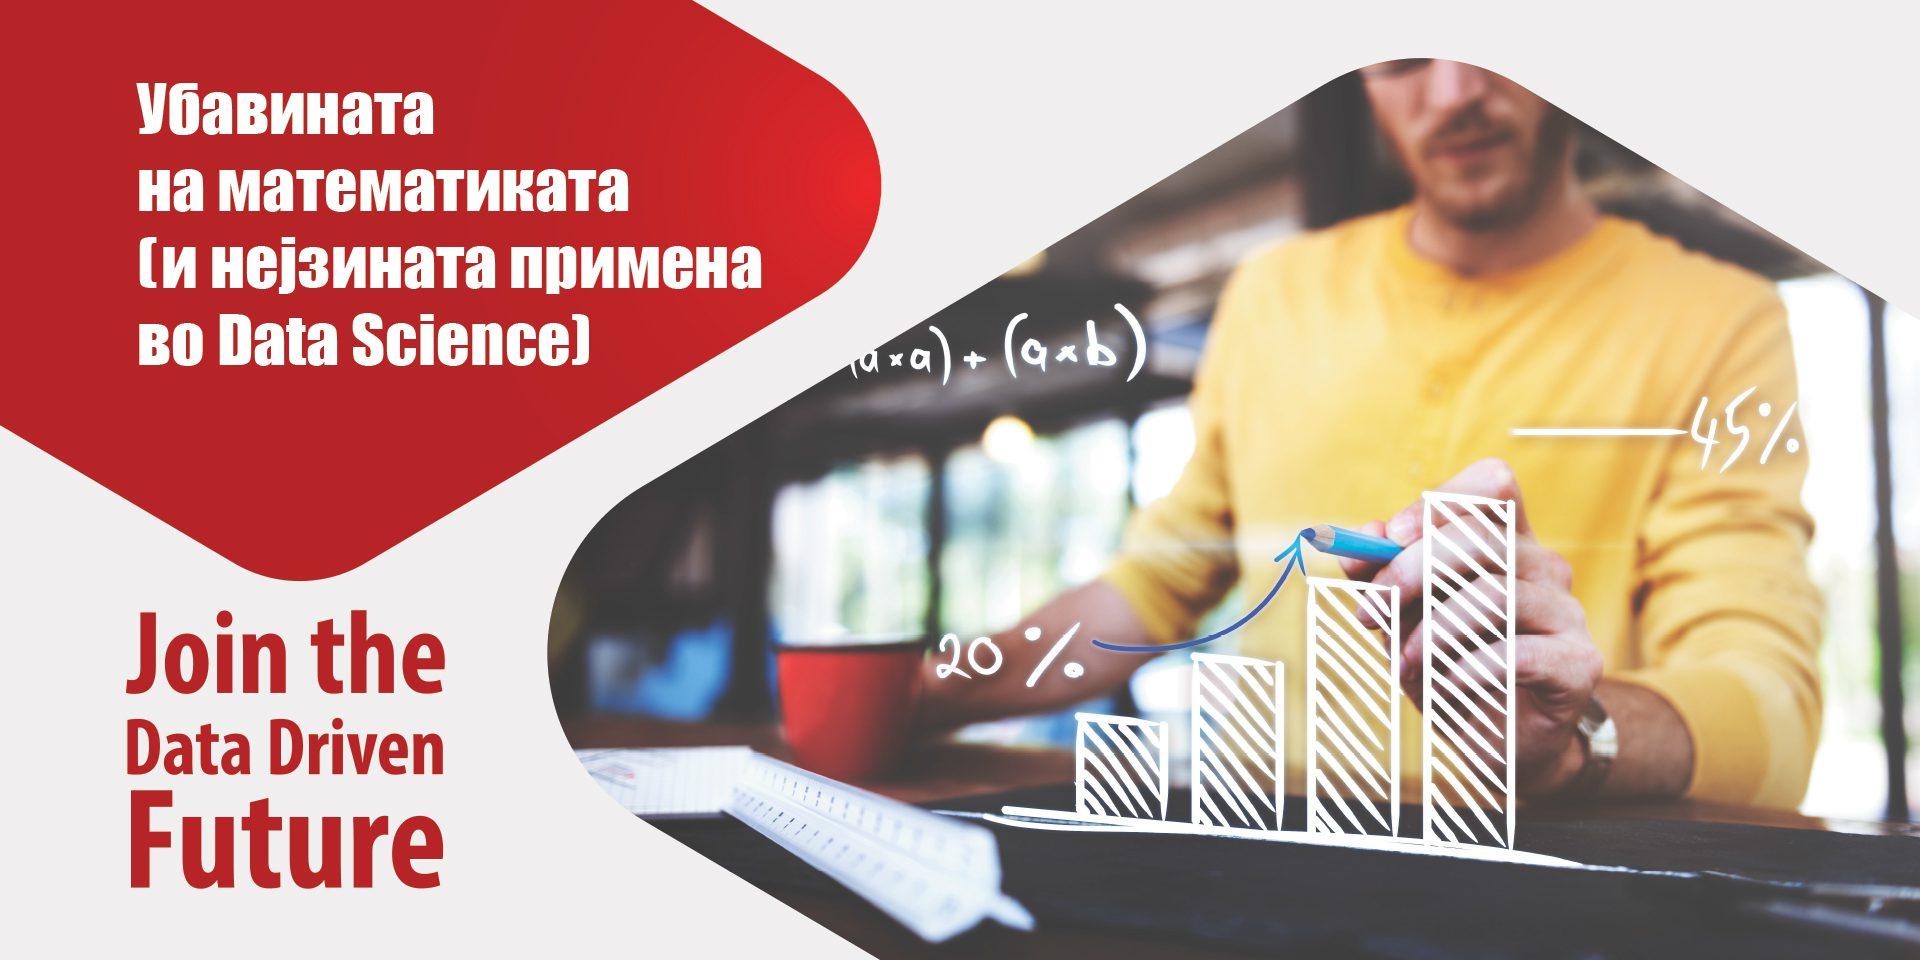 математика и data science